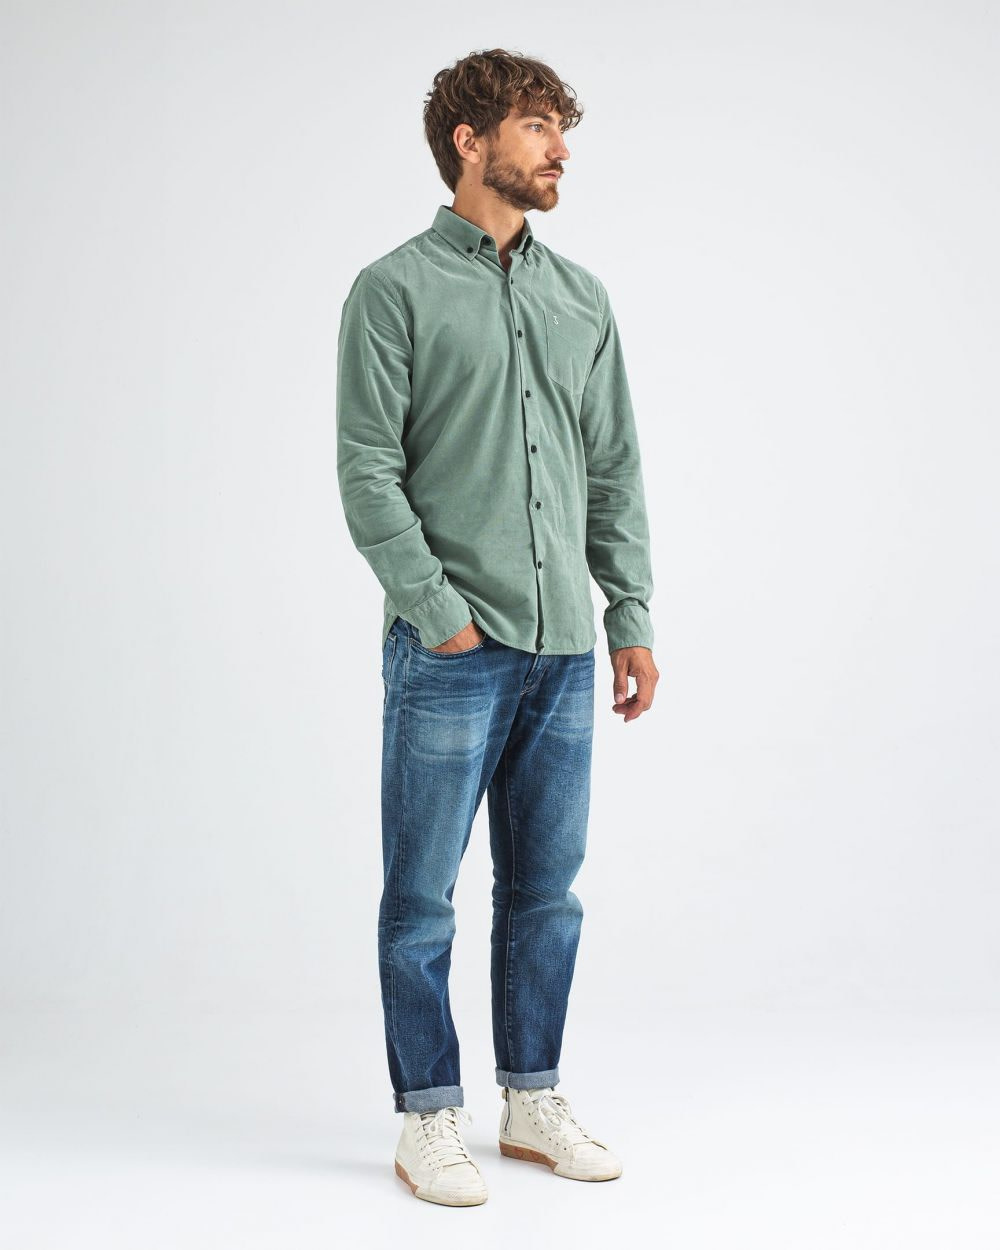 Robbins babycord shirt deplhi green-4